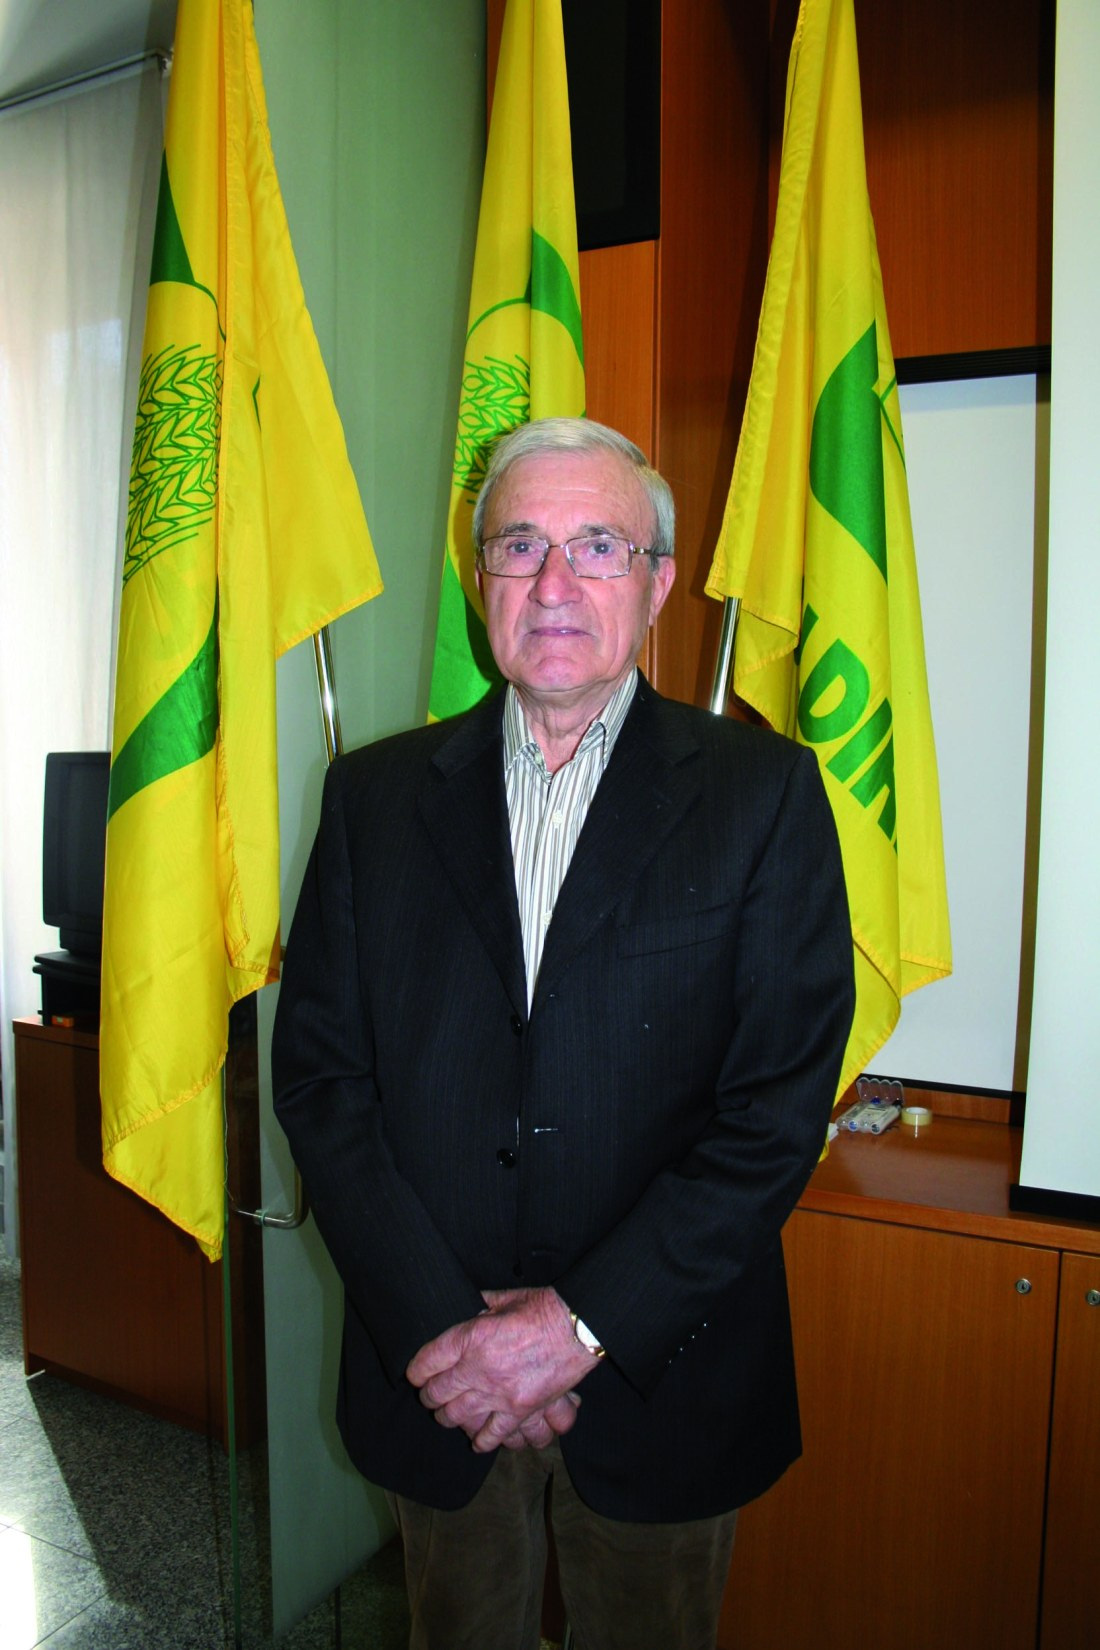 Bruno Tacchino